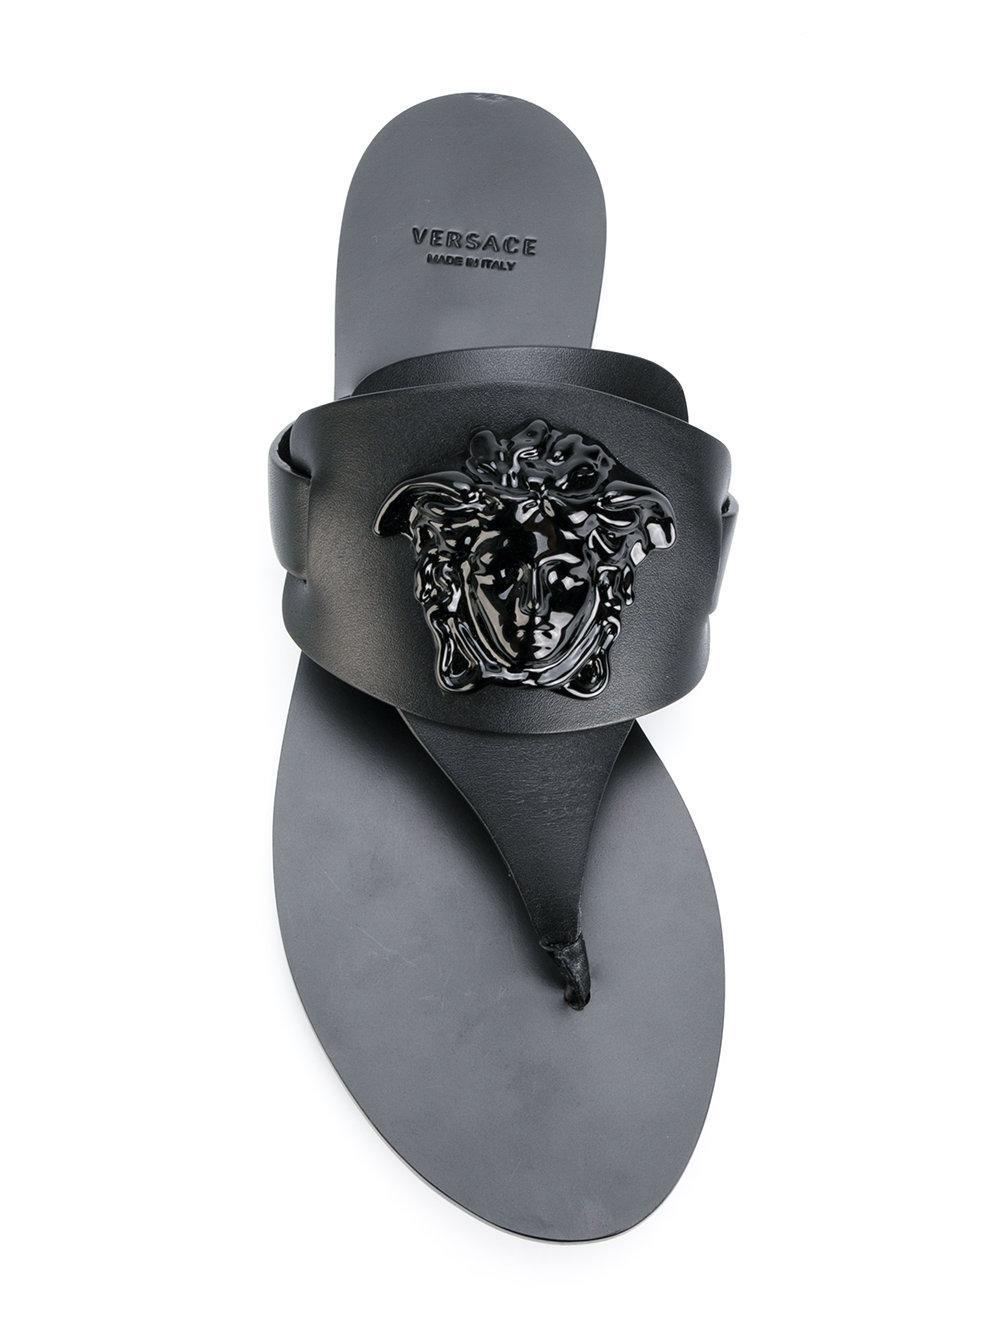 dc5395da855 Lyst - Versace Sandali Infradito  medusa Palazzo  in Black